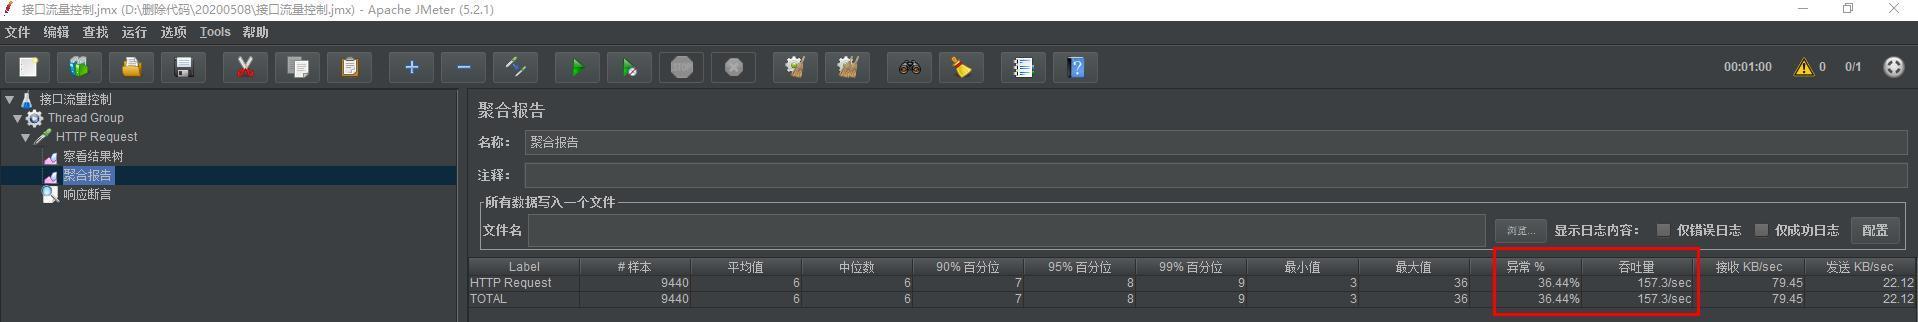 Springboot2.x + aop + Lua分布式接口限流实践